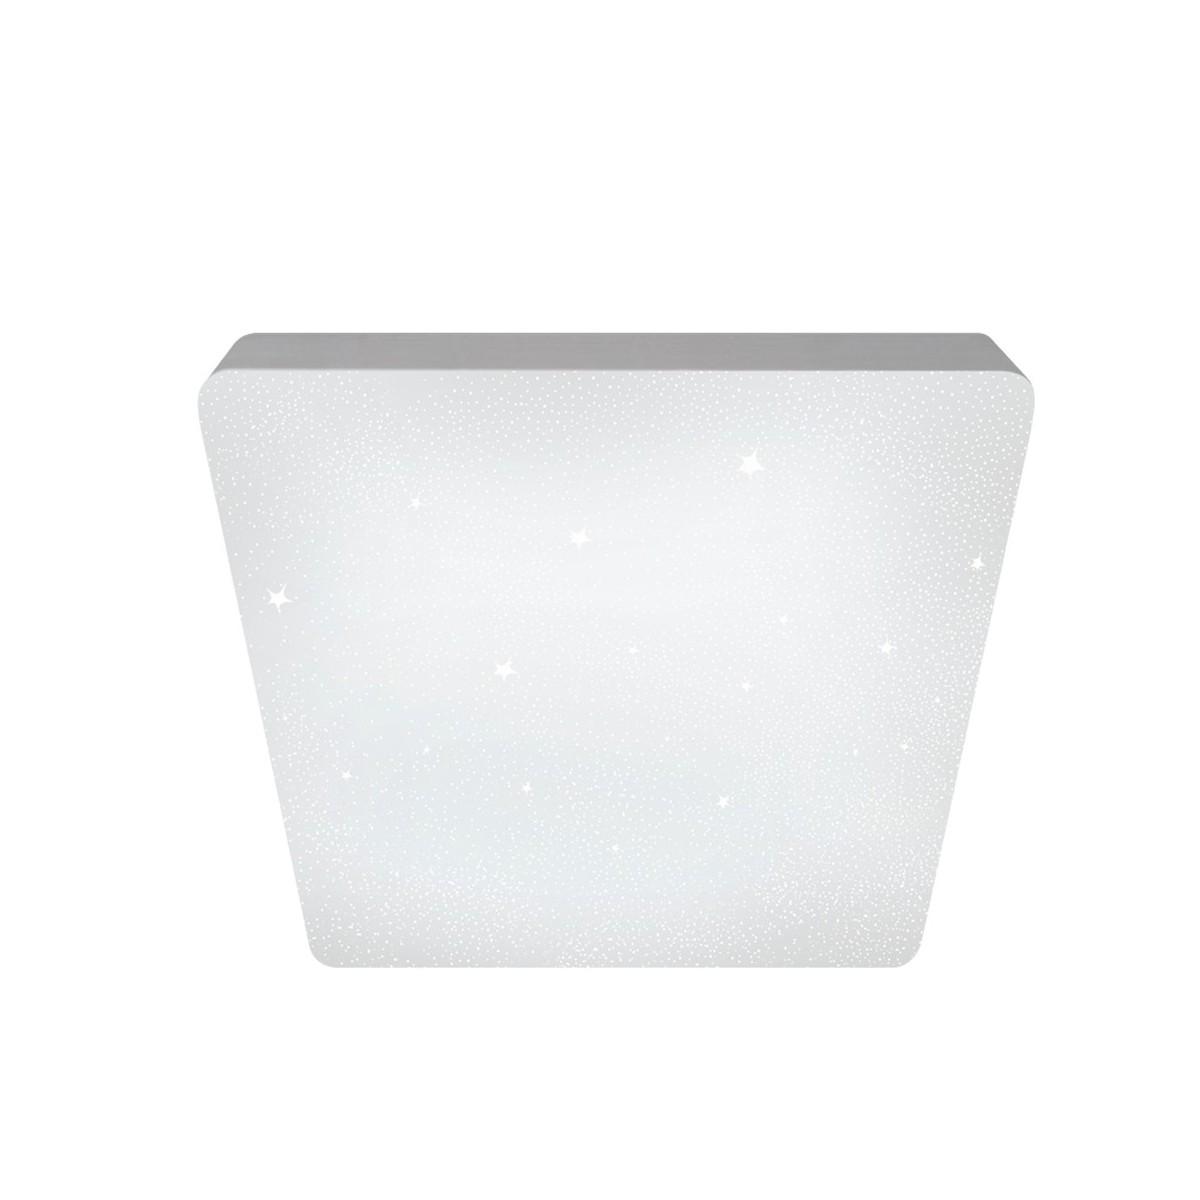 Plafón LED regulable 42w cuadrado Sever (2700-4000-6500K)